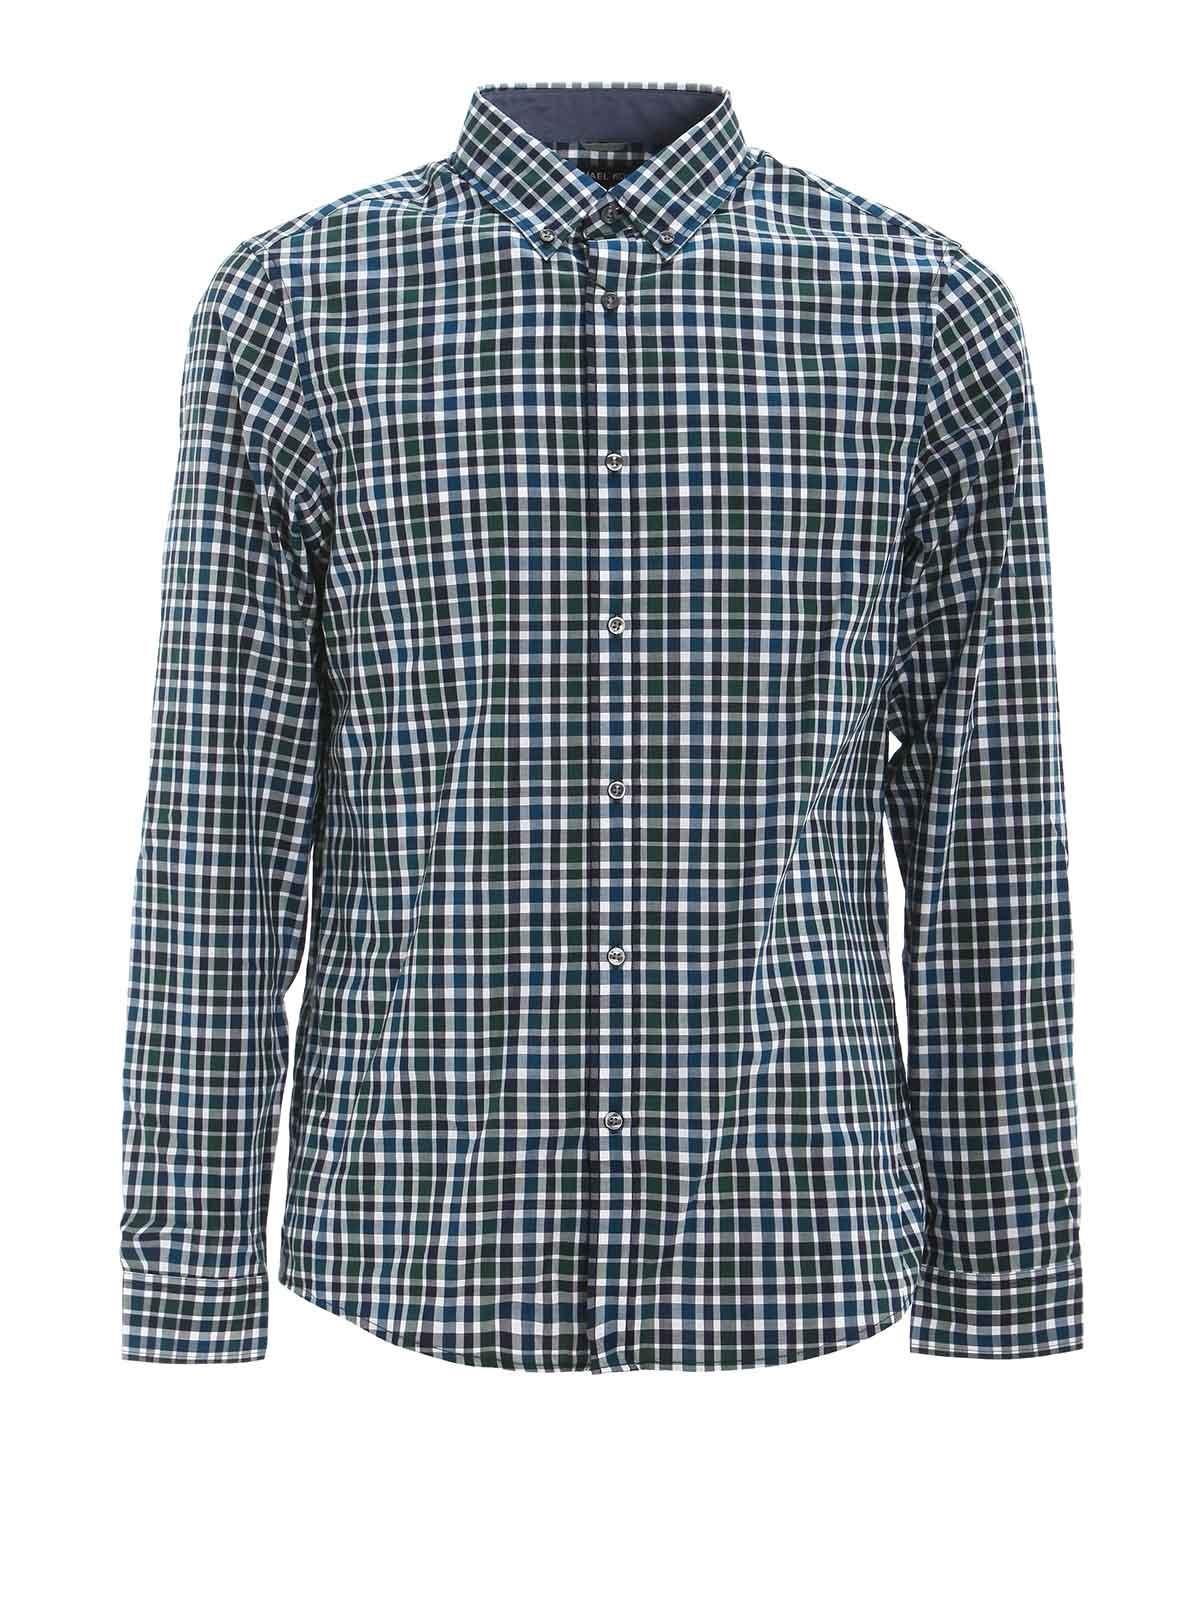 Slim fit check shirt by michael kors shirts ikrix for Slim fit check shirt